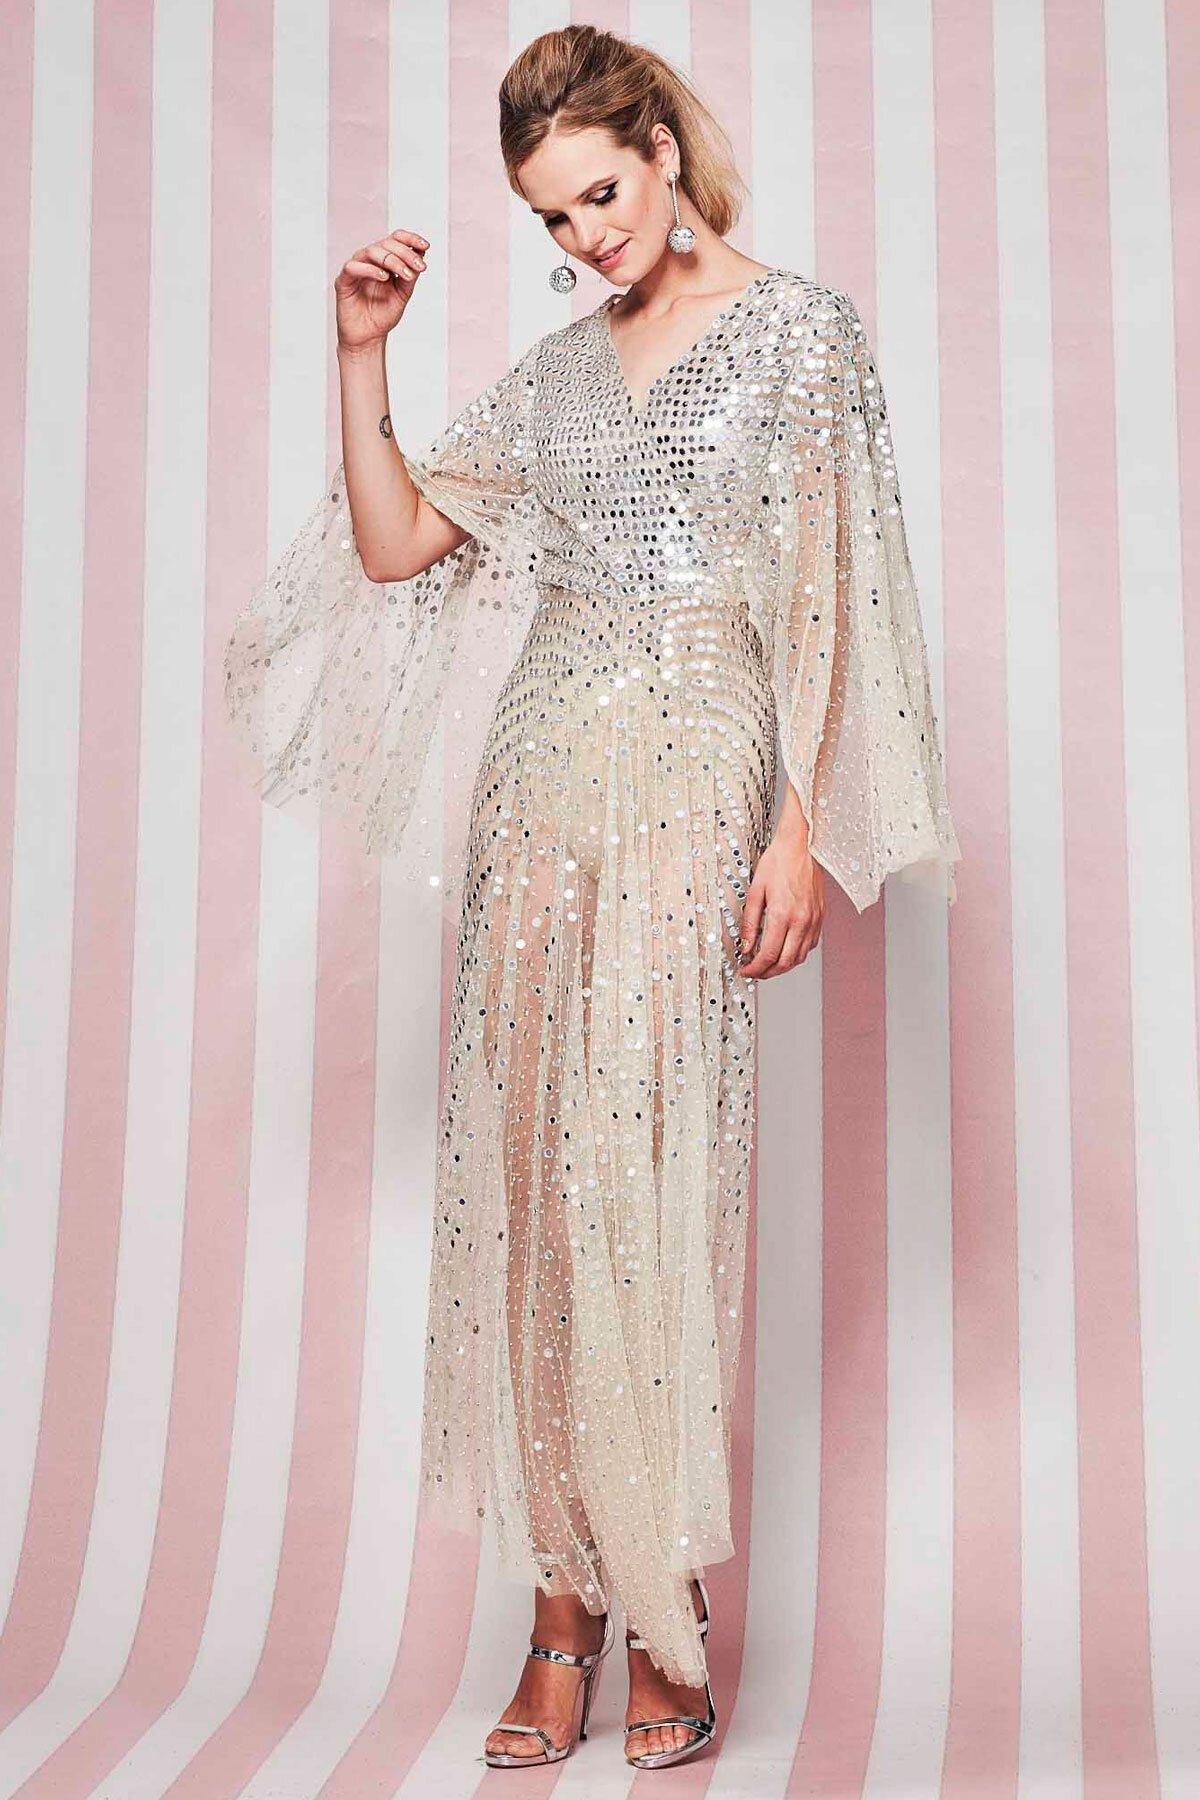 680dedc9 GOLDEN GLOBE Dress - Trelise Cooper-Sale : Trelise Cooper Online - MIRROR  MIRROR TRELISE. My Account · 0. AUD, NZD. null